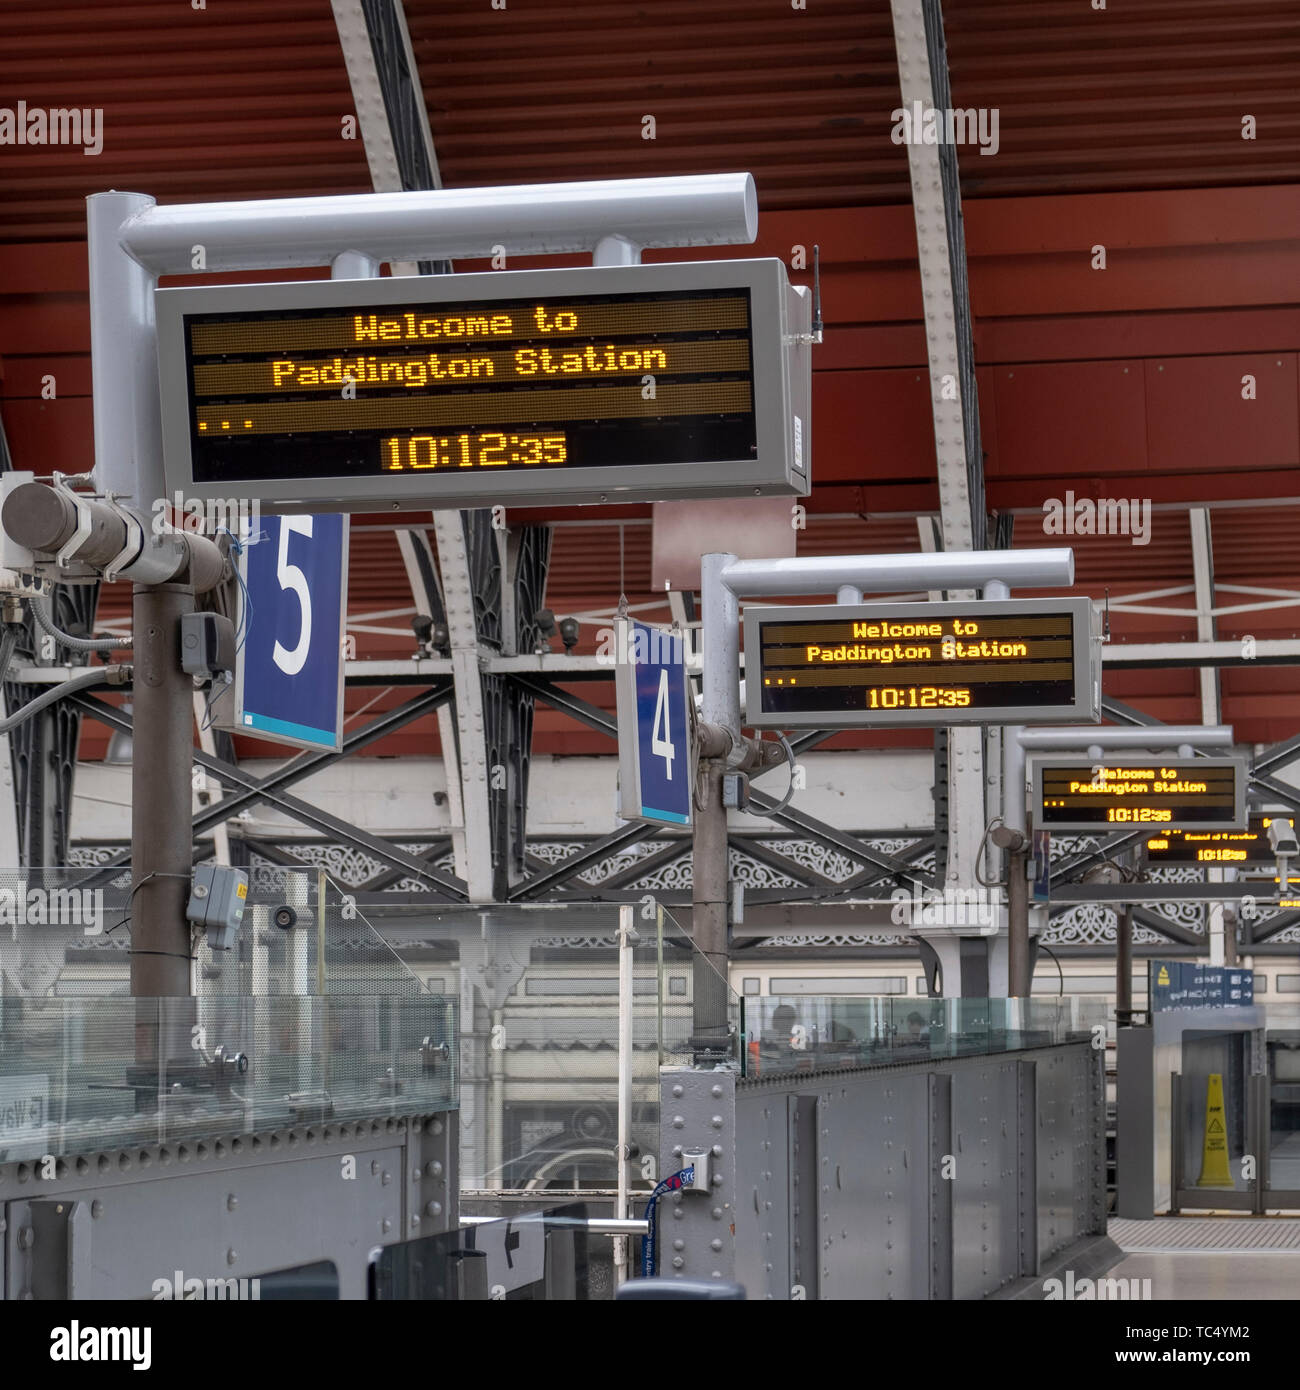 Platform indicators at Paddington Station, London, England - Stock Image